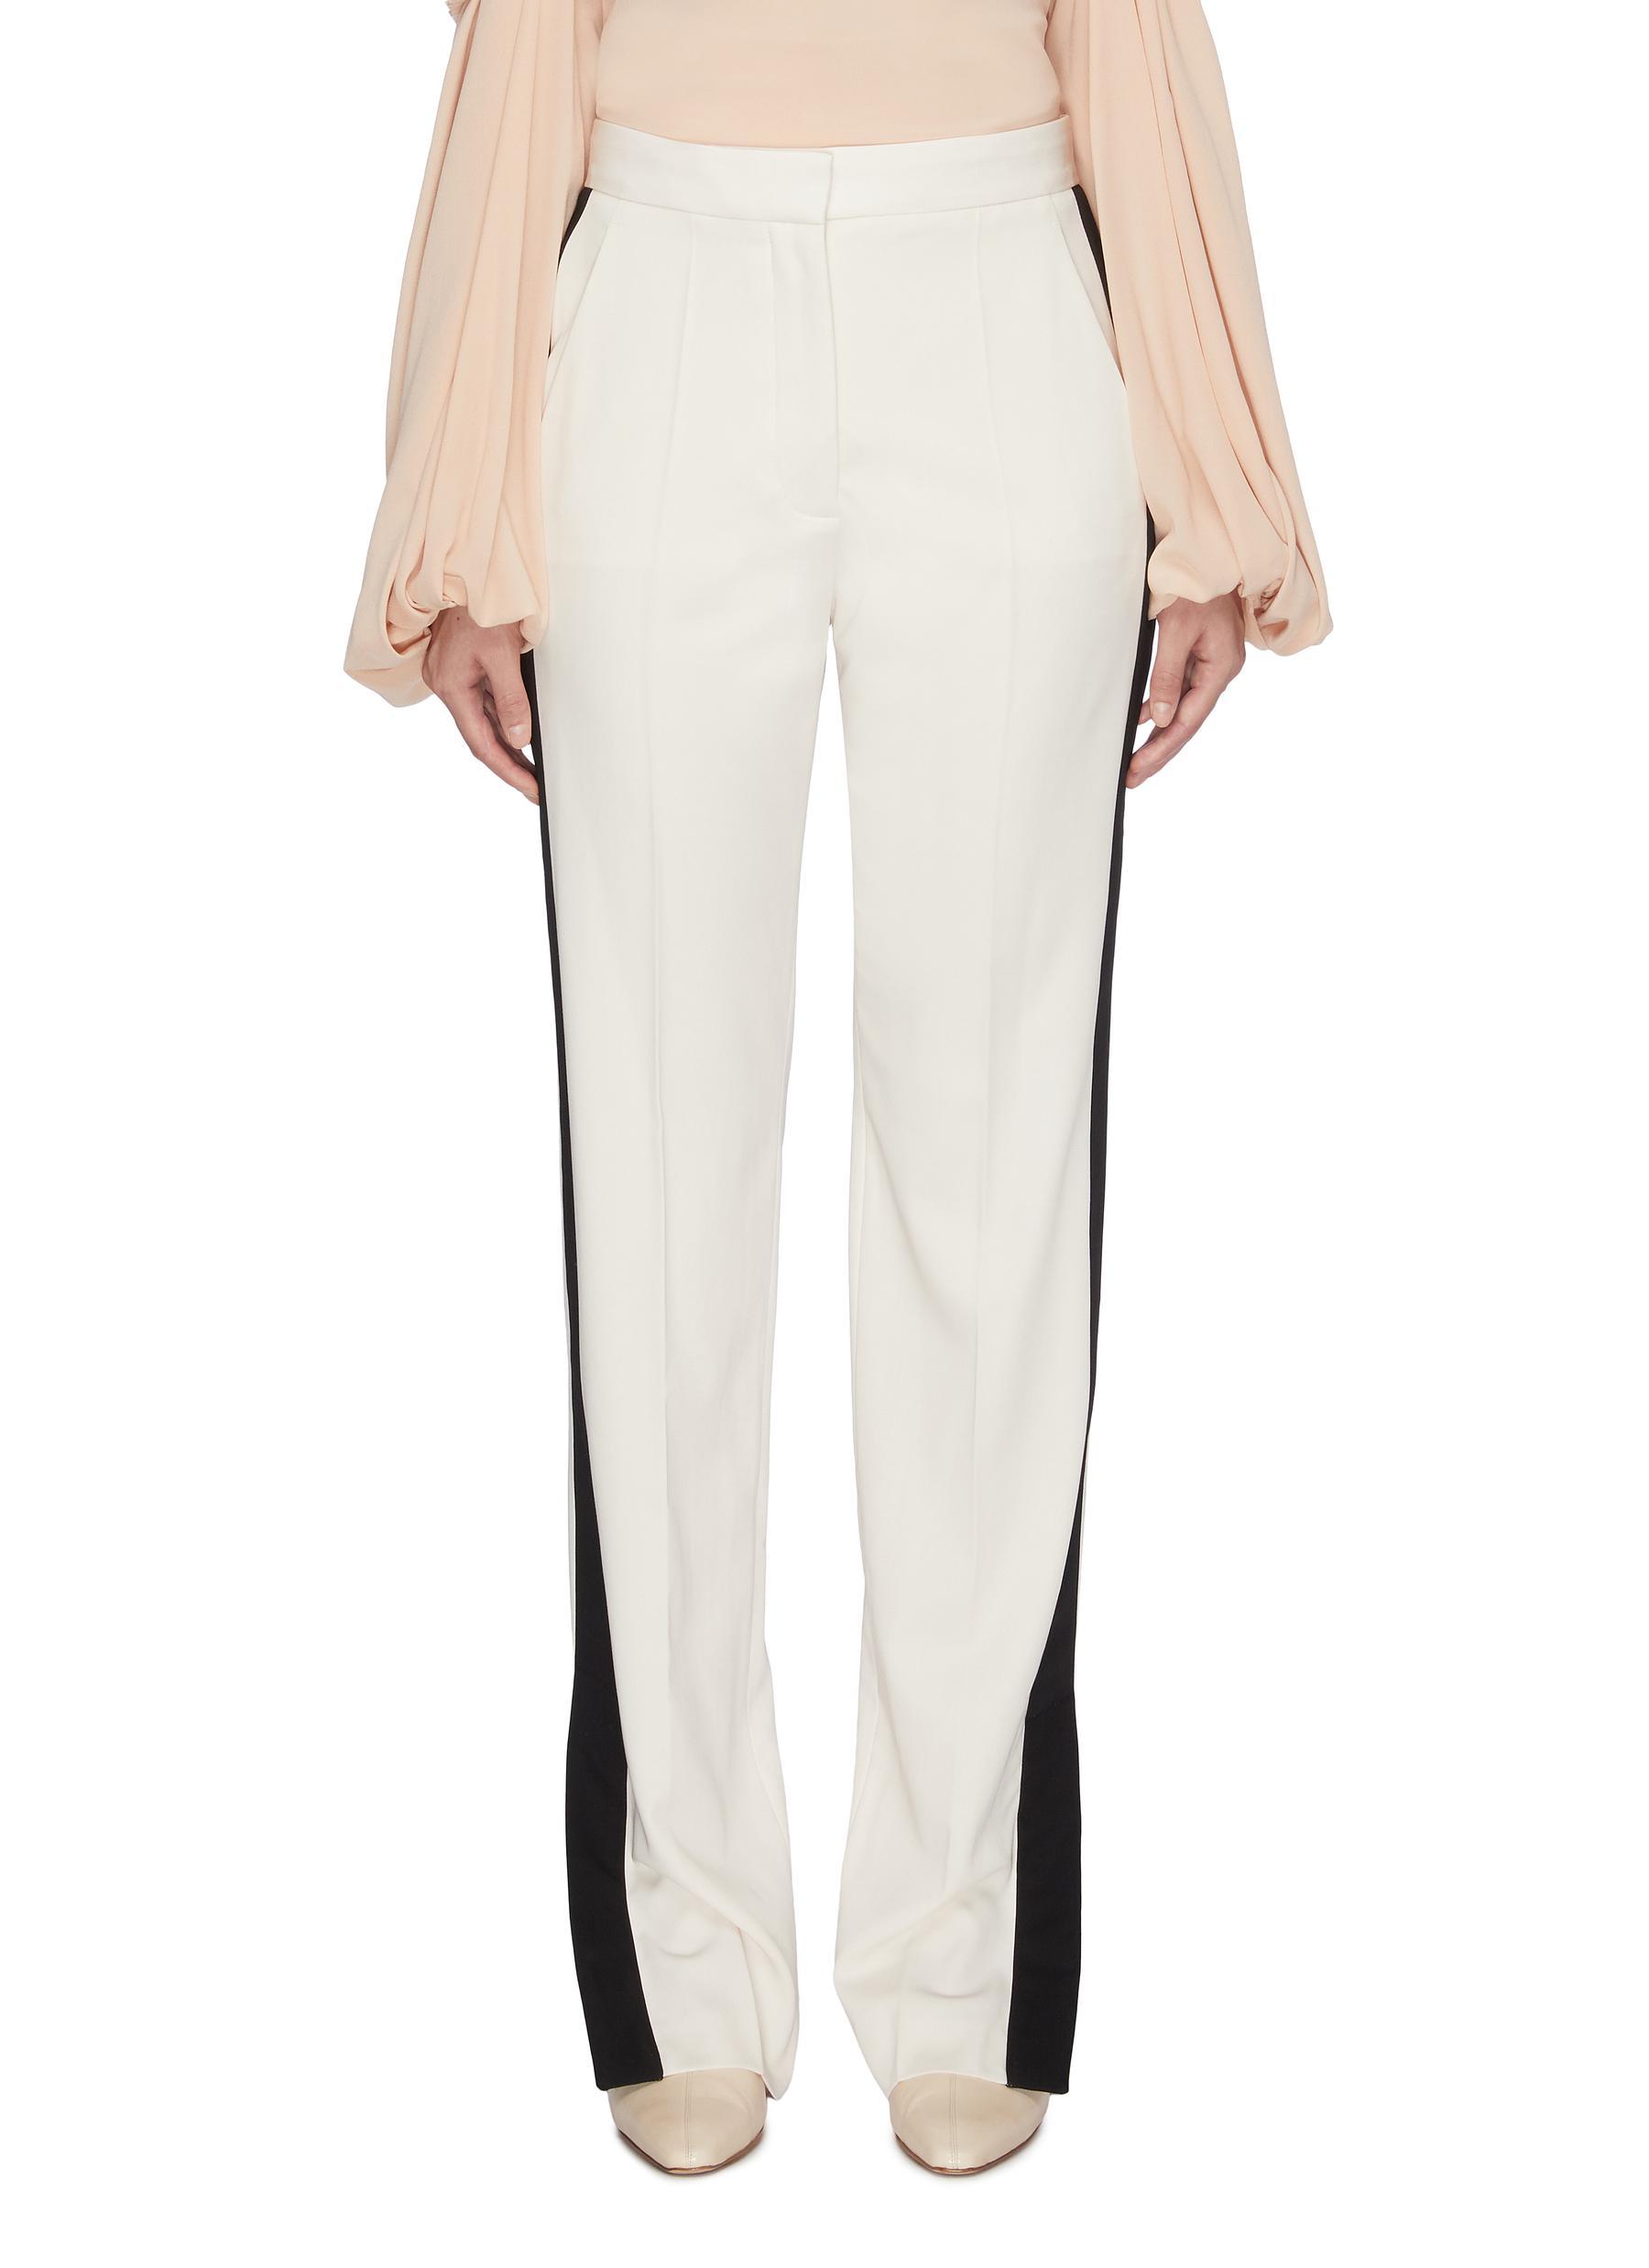 Colourblock outseam pants by Stella Mccartney